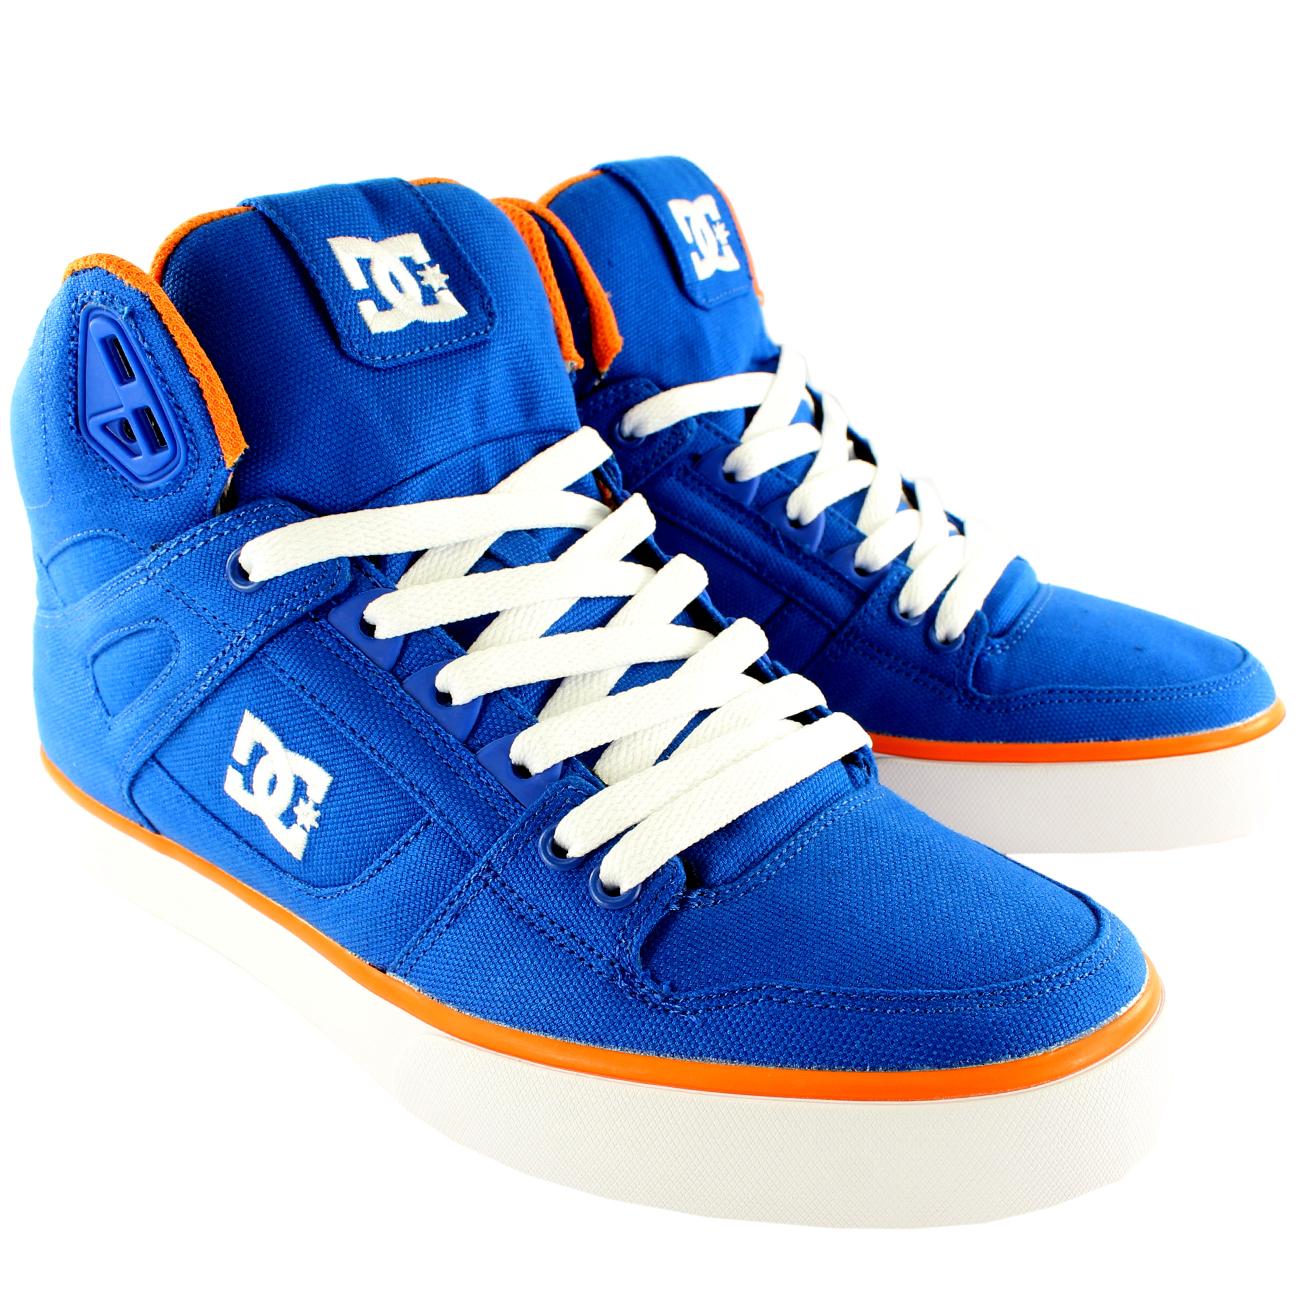 DC Shoes Spartan High Top Skate Shoes